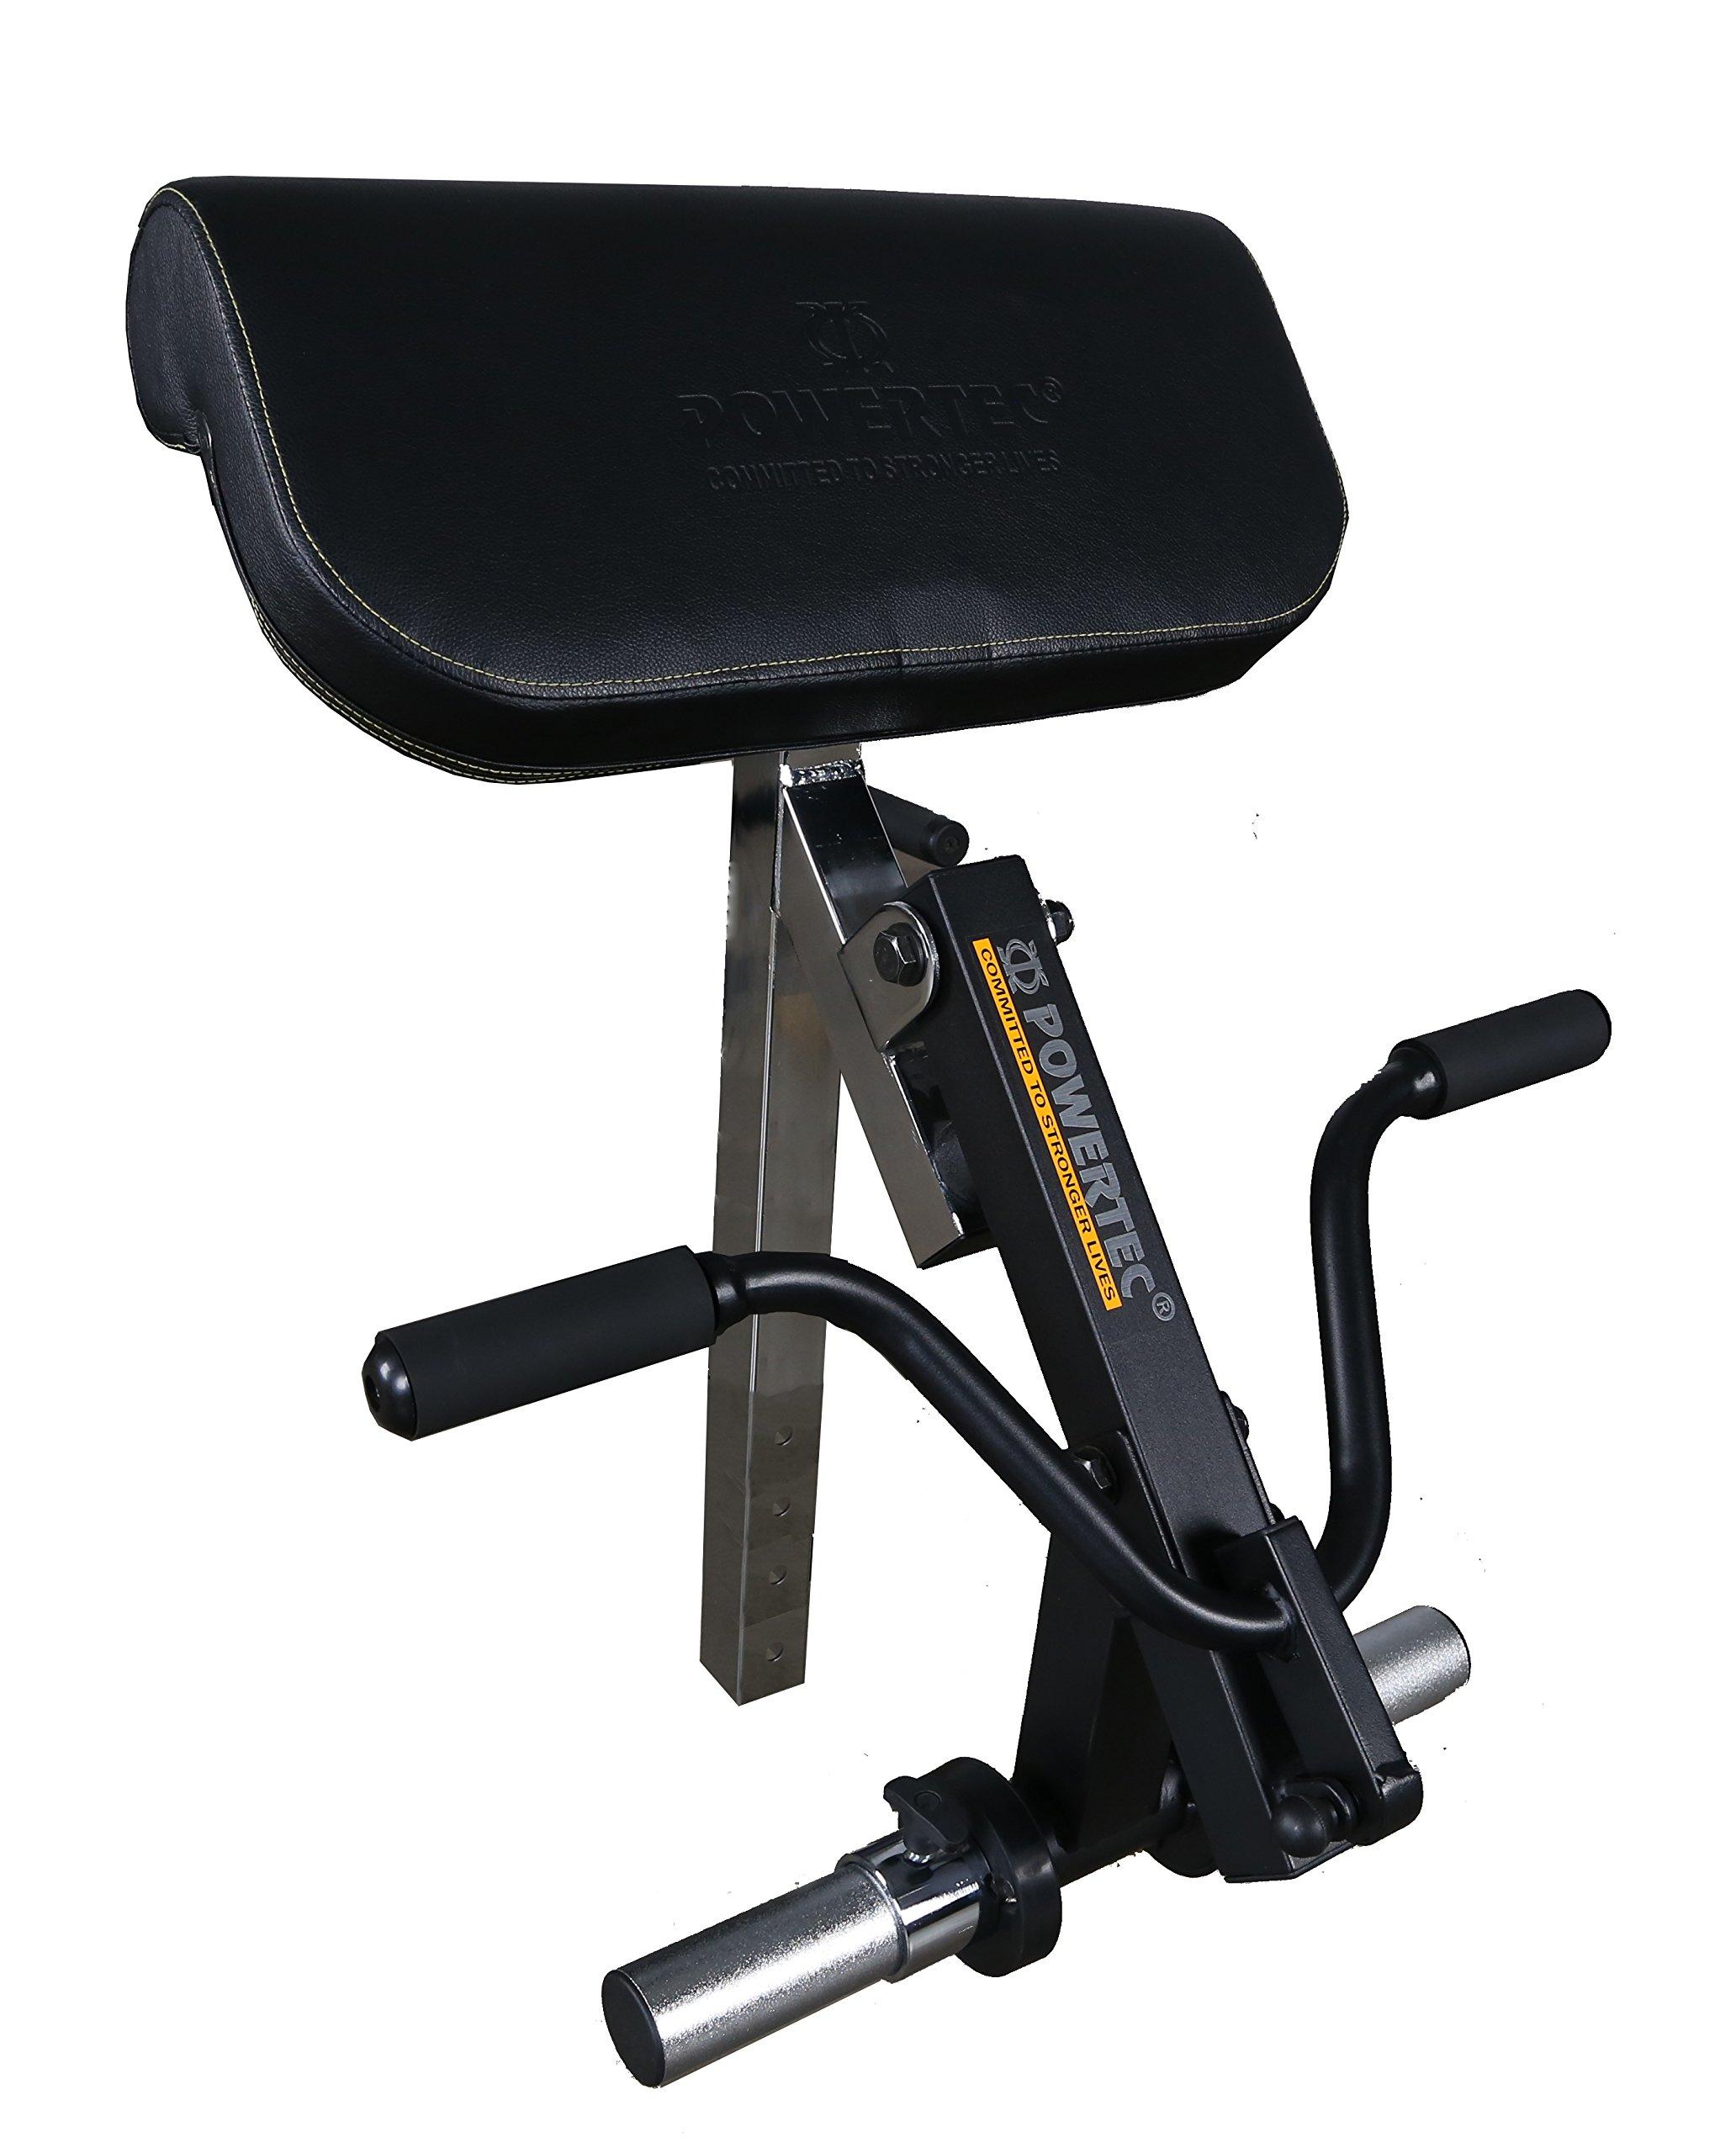 Powertec Fitness Workbench Curl Machine Accessory Black by Powertec Fitness